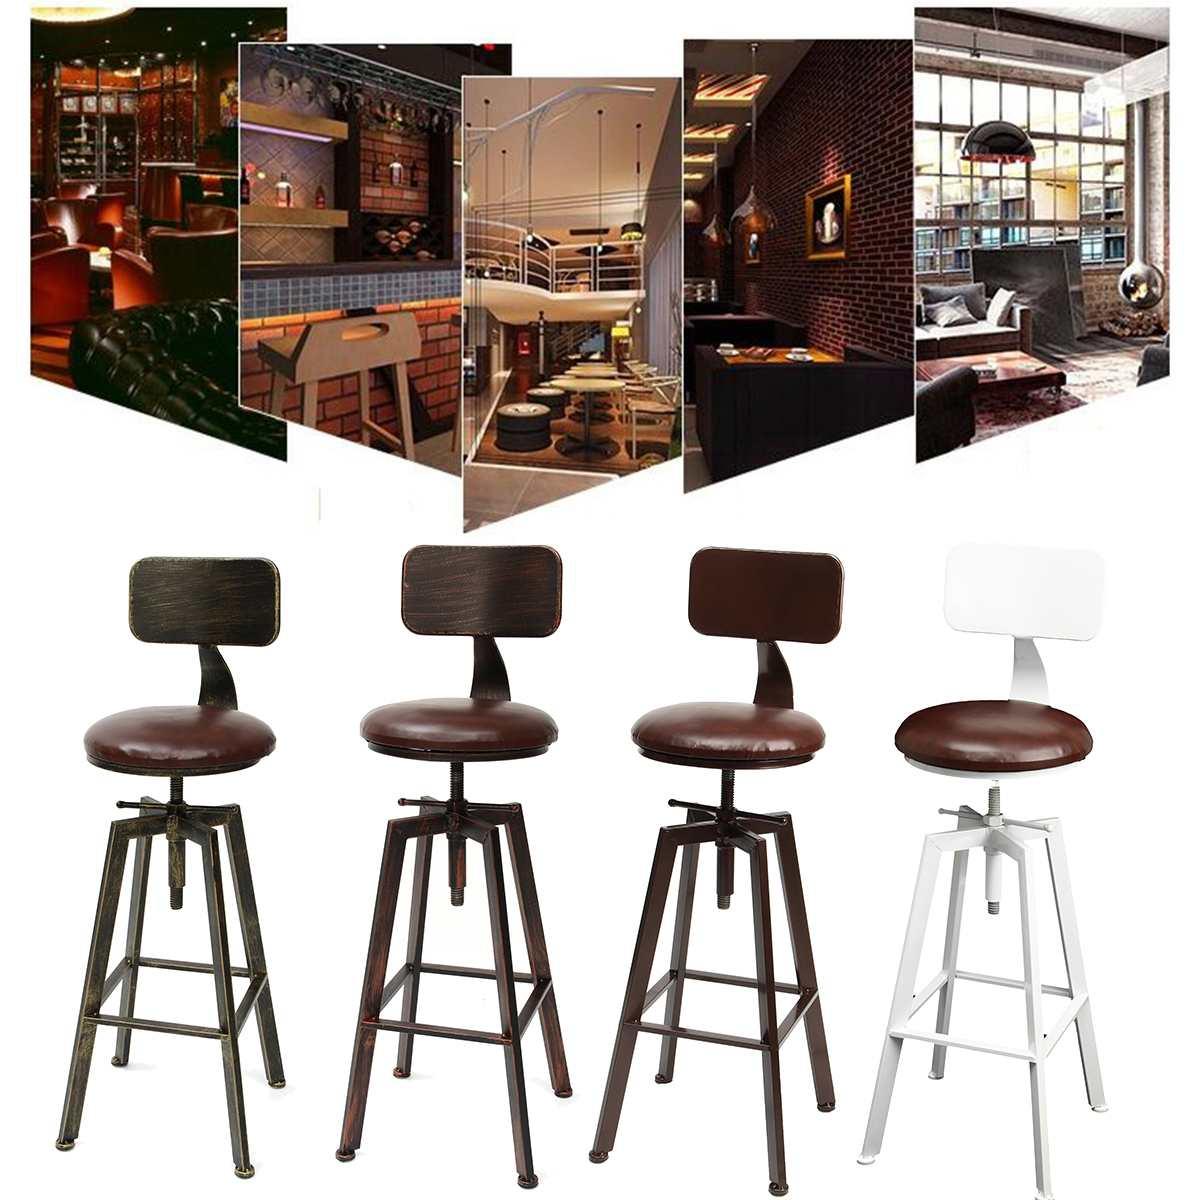 Self-Conscious Bancos Moderno Sedia Barstool Para Barra Industriel Comptoir Hokery Sandalyesi Silla Stool Modern Tabouret De Moderne Bar Chair Furniture